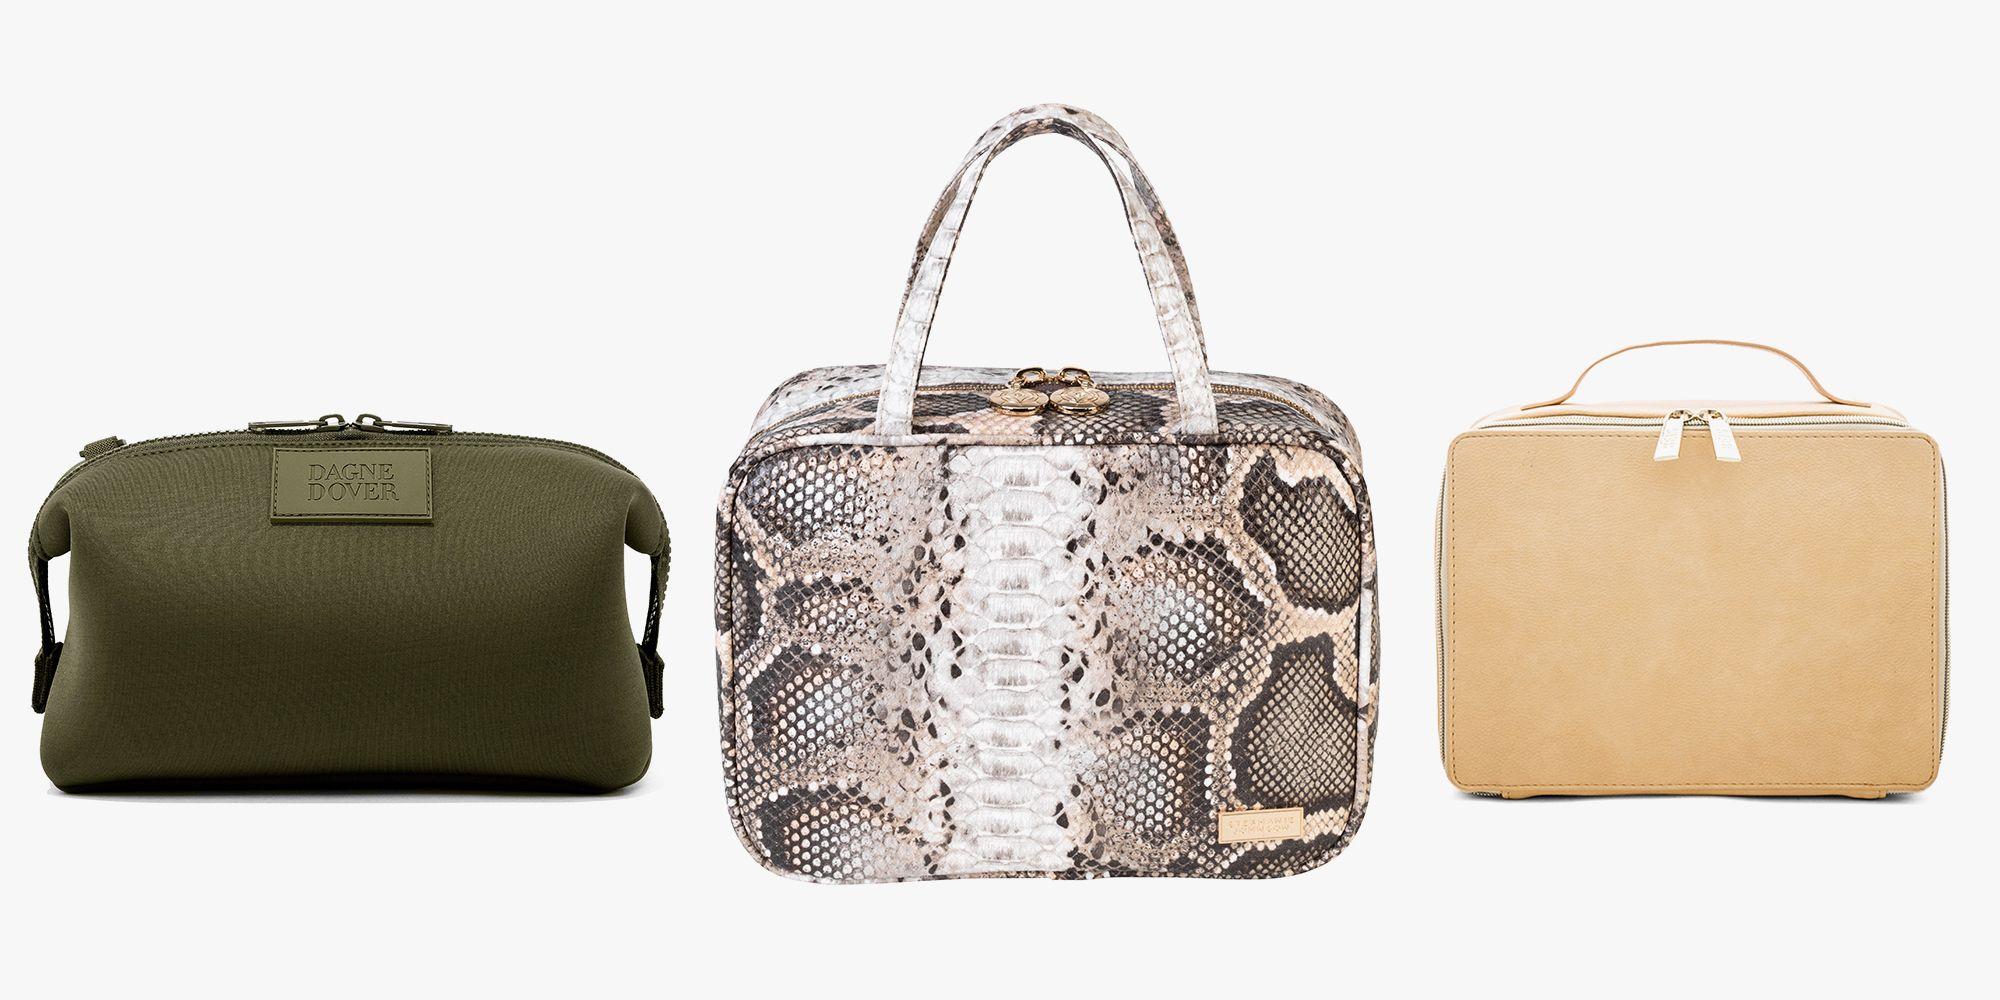 deb95b527ab5 15 Best Toiletry Bags for Women - 15 Dopp Kits